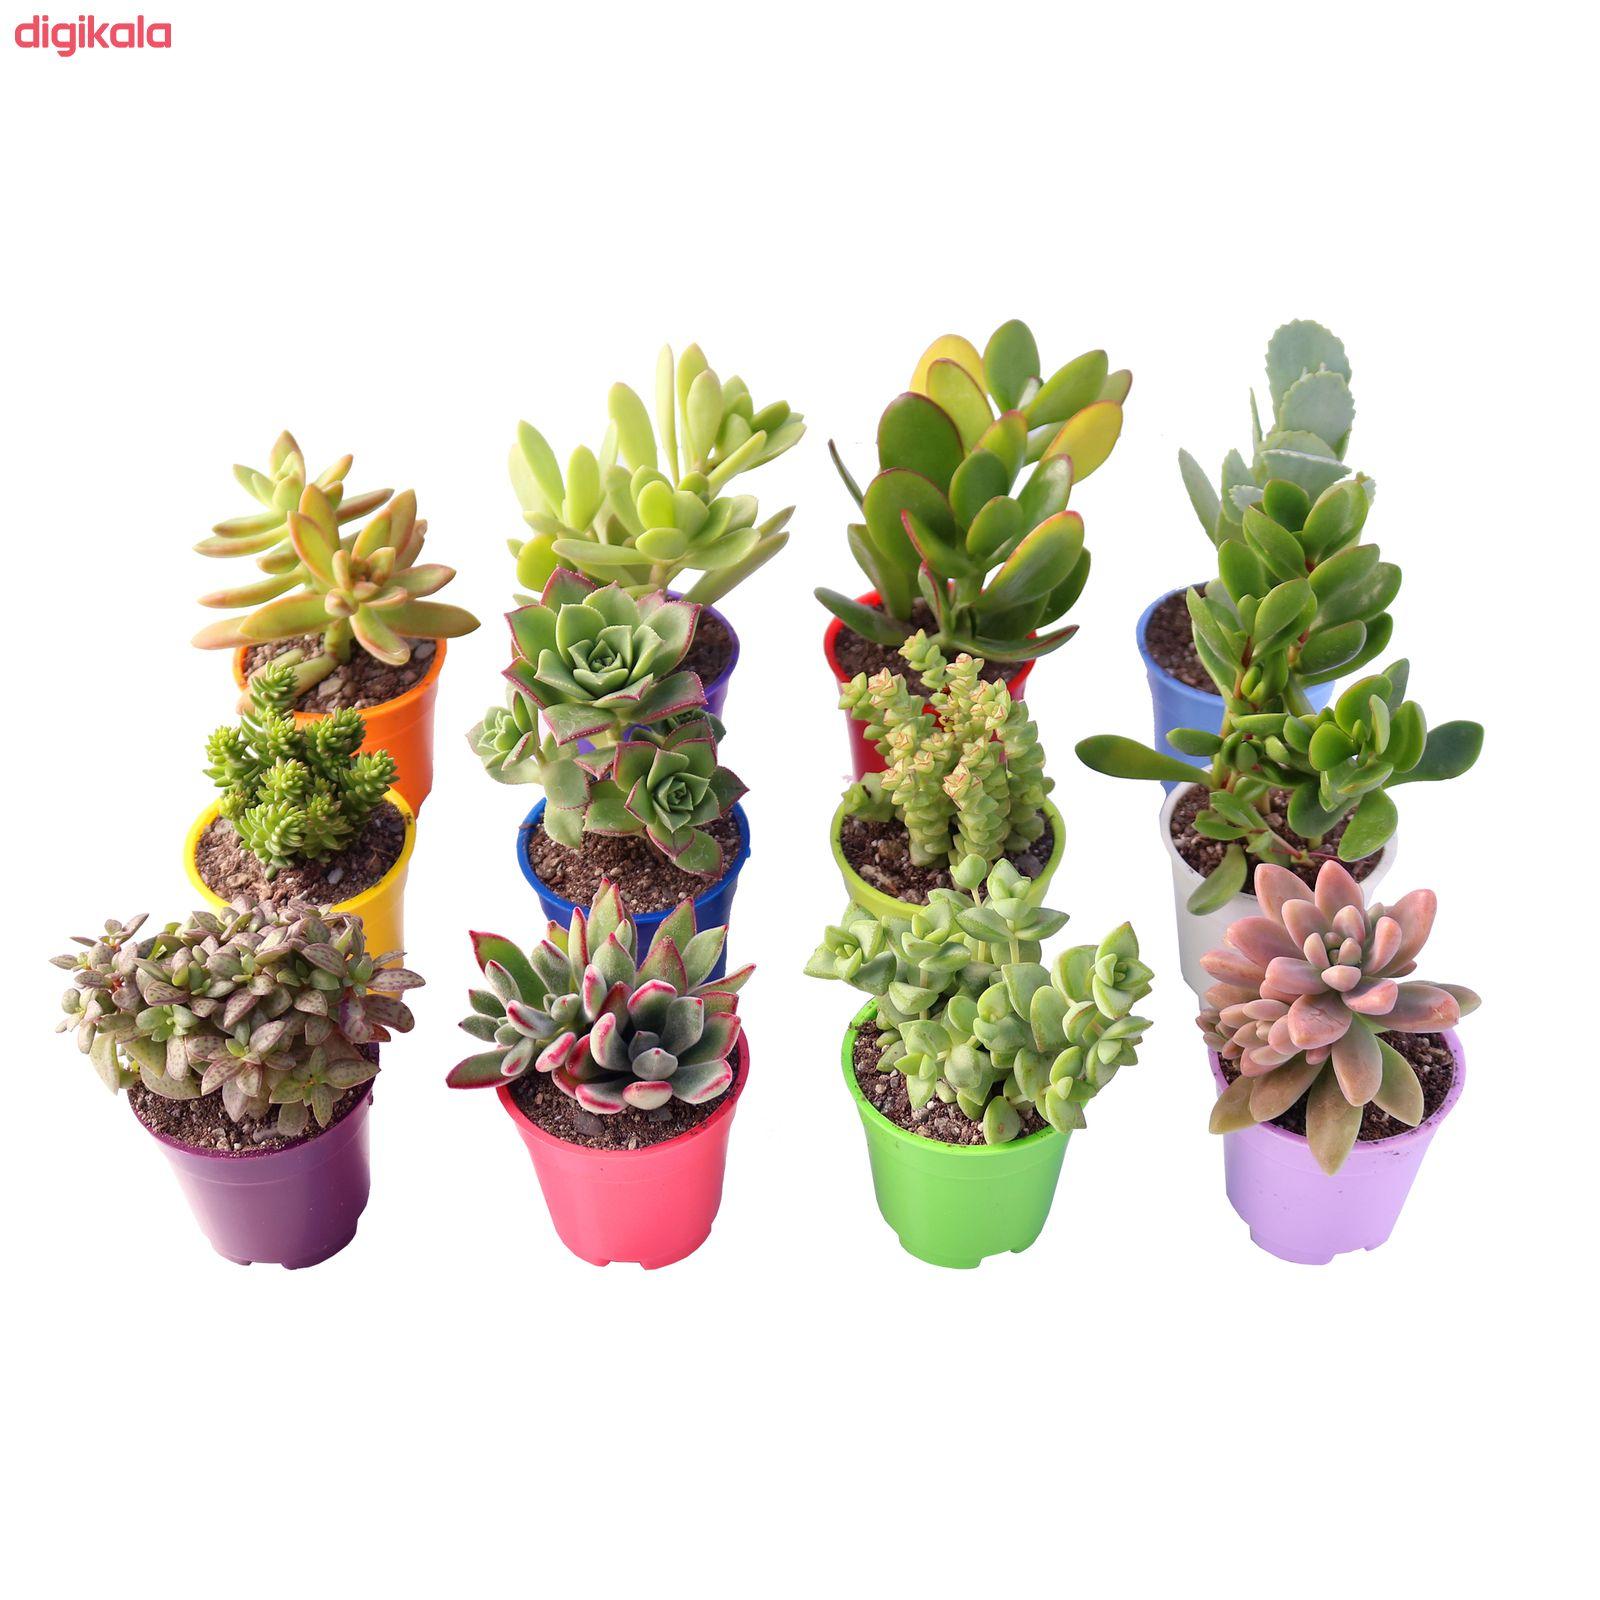 گیاه طبیعی ساکولنت آیدین کاکتوس کد CB-003 بسته 12 عددی main 1 2